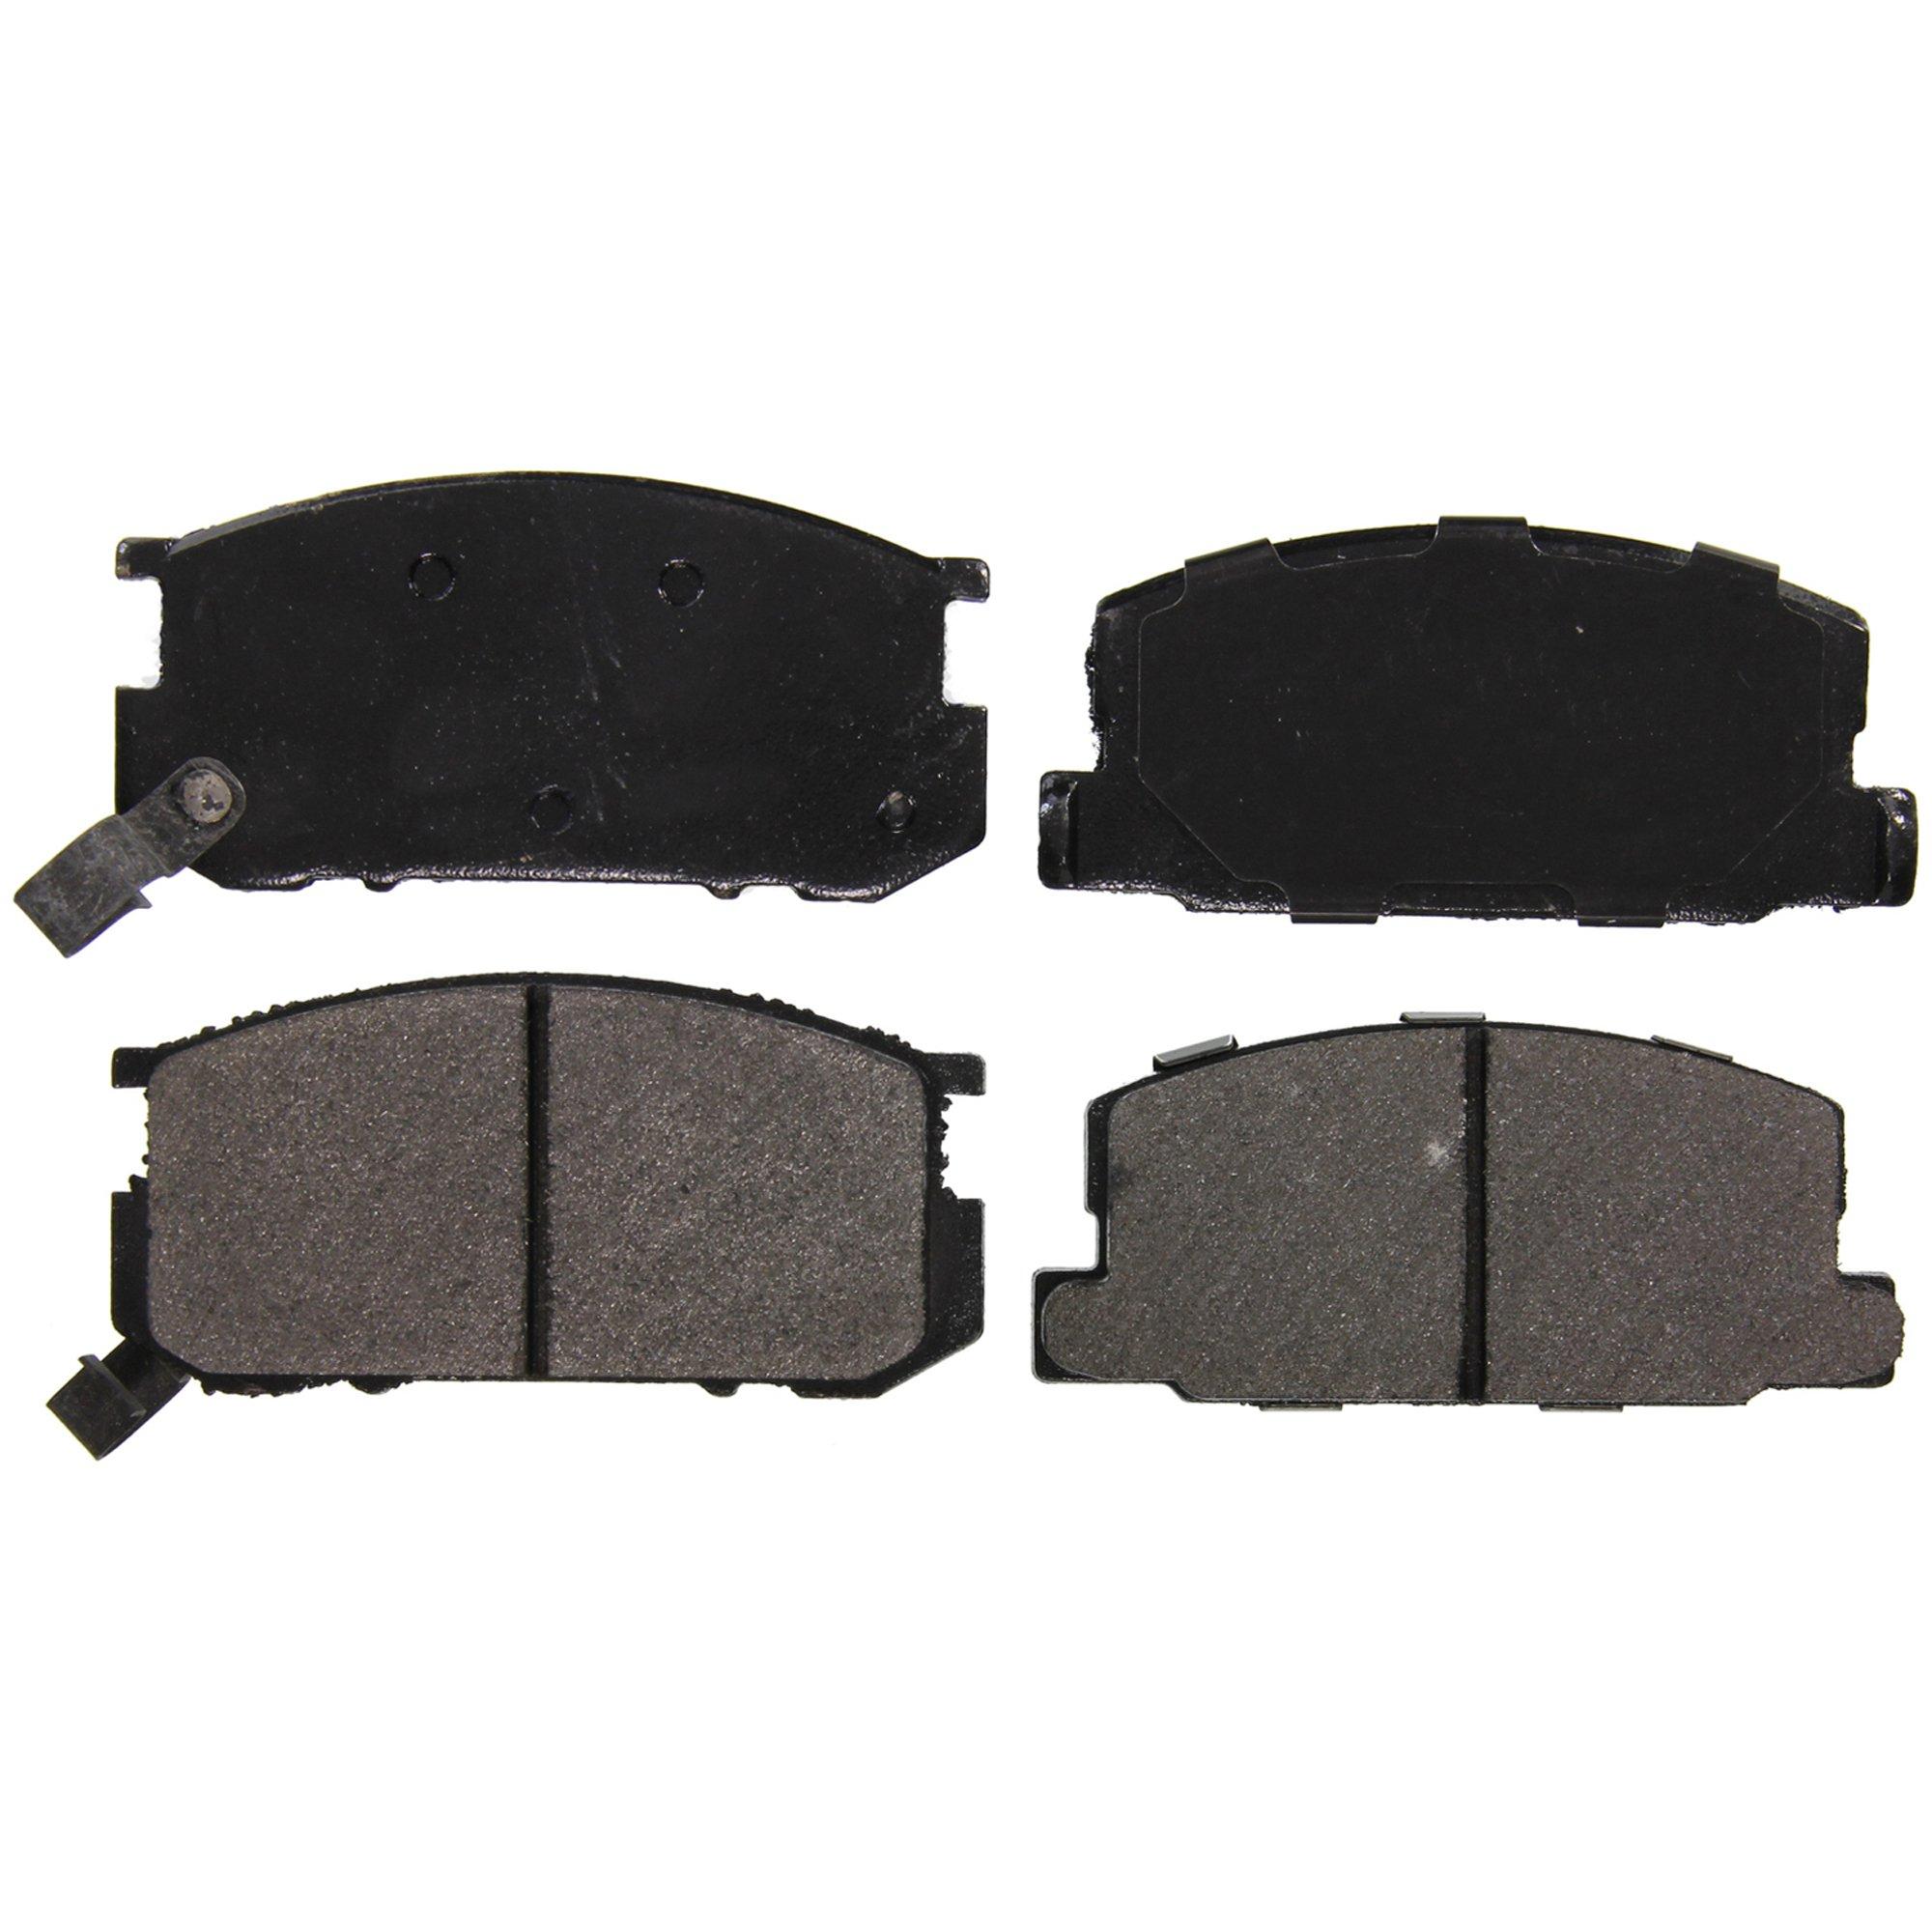 Disc Brake Pad Set-ThermoQuiet Disc Brake Pad Front fits 81-87 Toyota Corolla